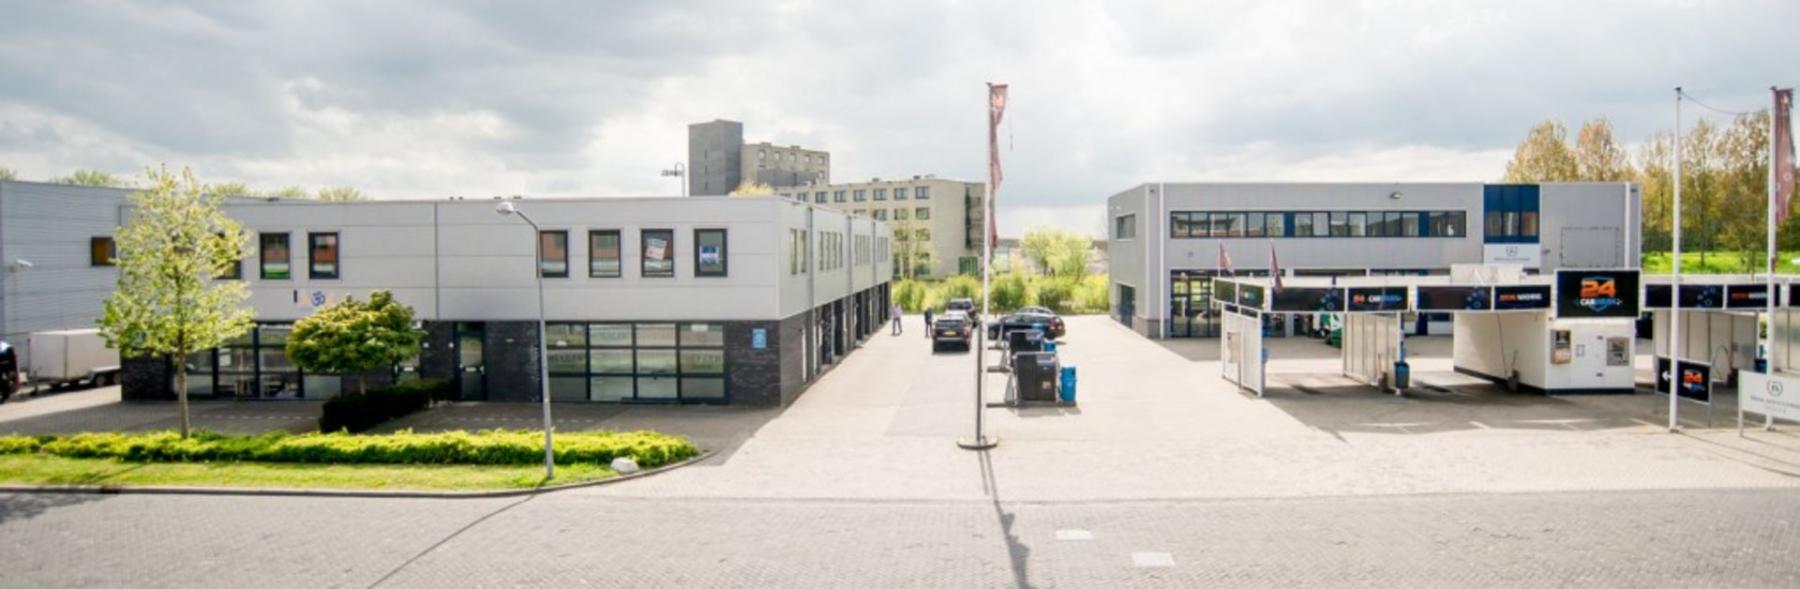 Katernstraat 33A - Almere